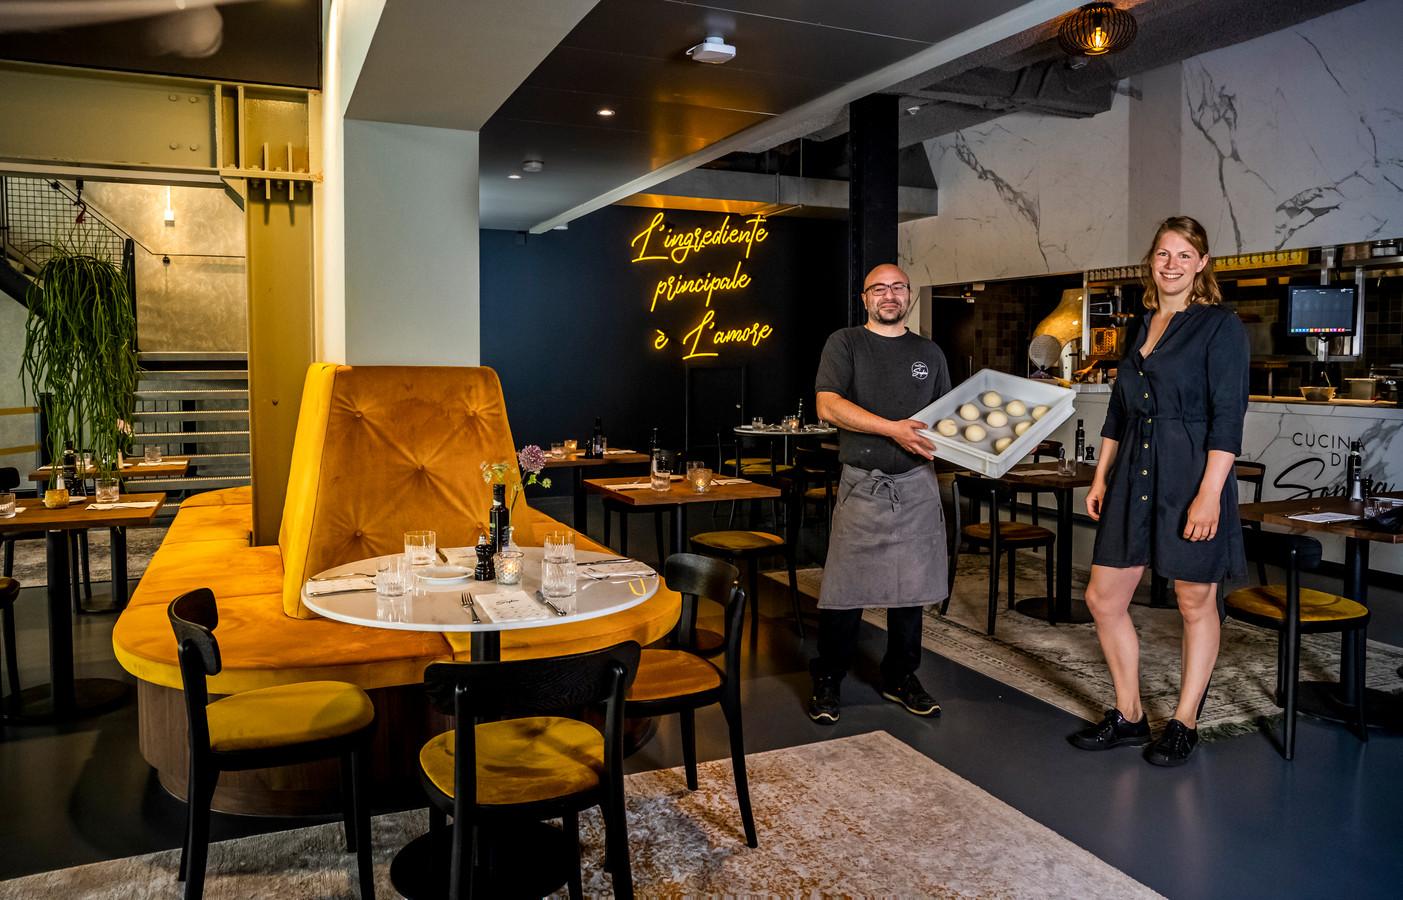 Trattoria Sophia in het Lloydkwartier, met chef-kok Carmelo Incani en bedrijfsleider Tess Smeman.